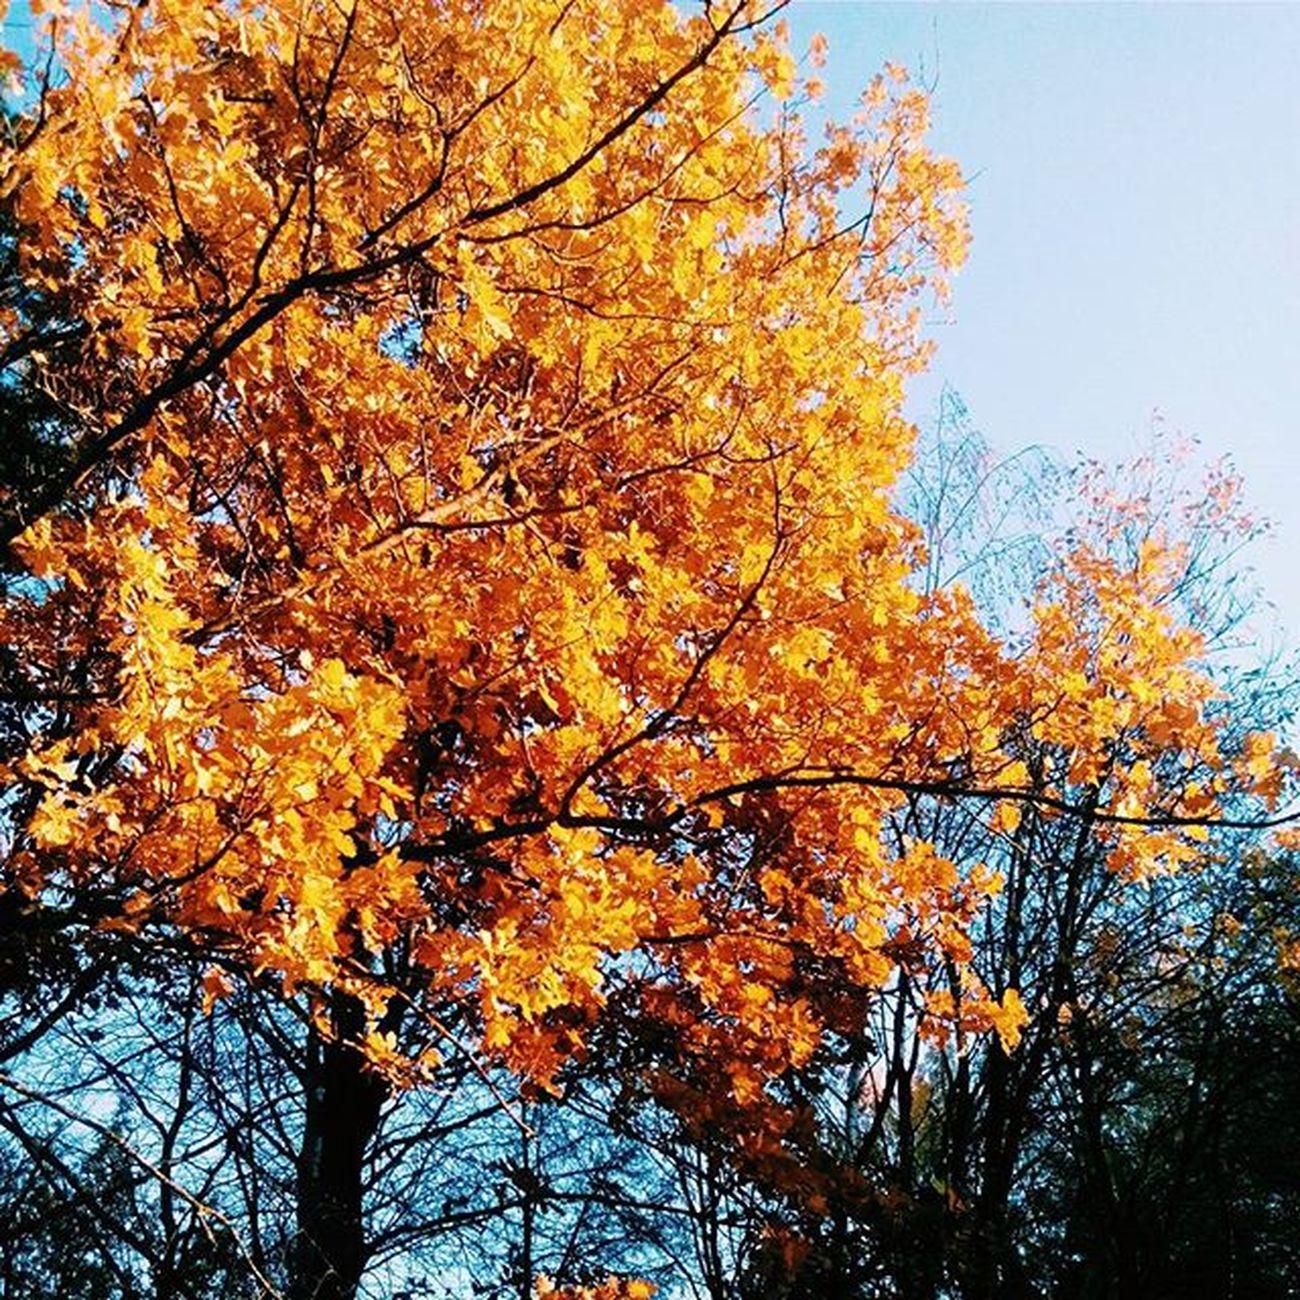 Холодно,но так красиво💕😍 Autumn Yellow Orang Tree Bsu Rocha Blue Sky T4l Followme Goodtime Goodday Vscocam Vscobe Vscocam Vscobelarus Vscominsk